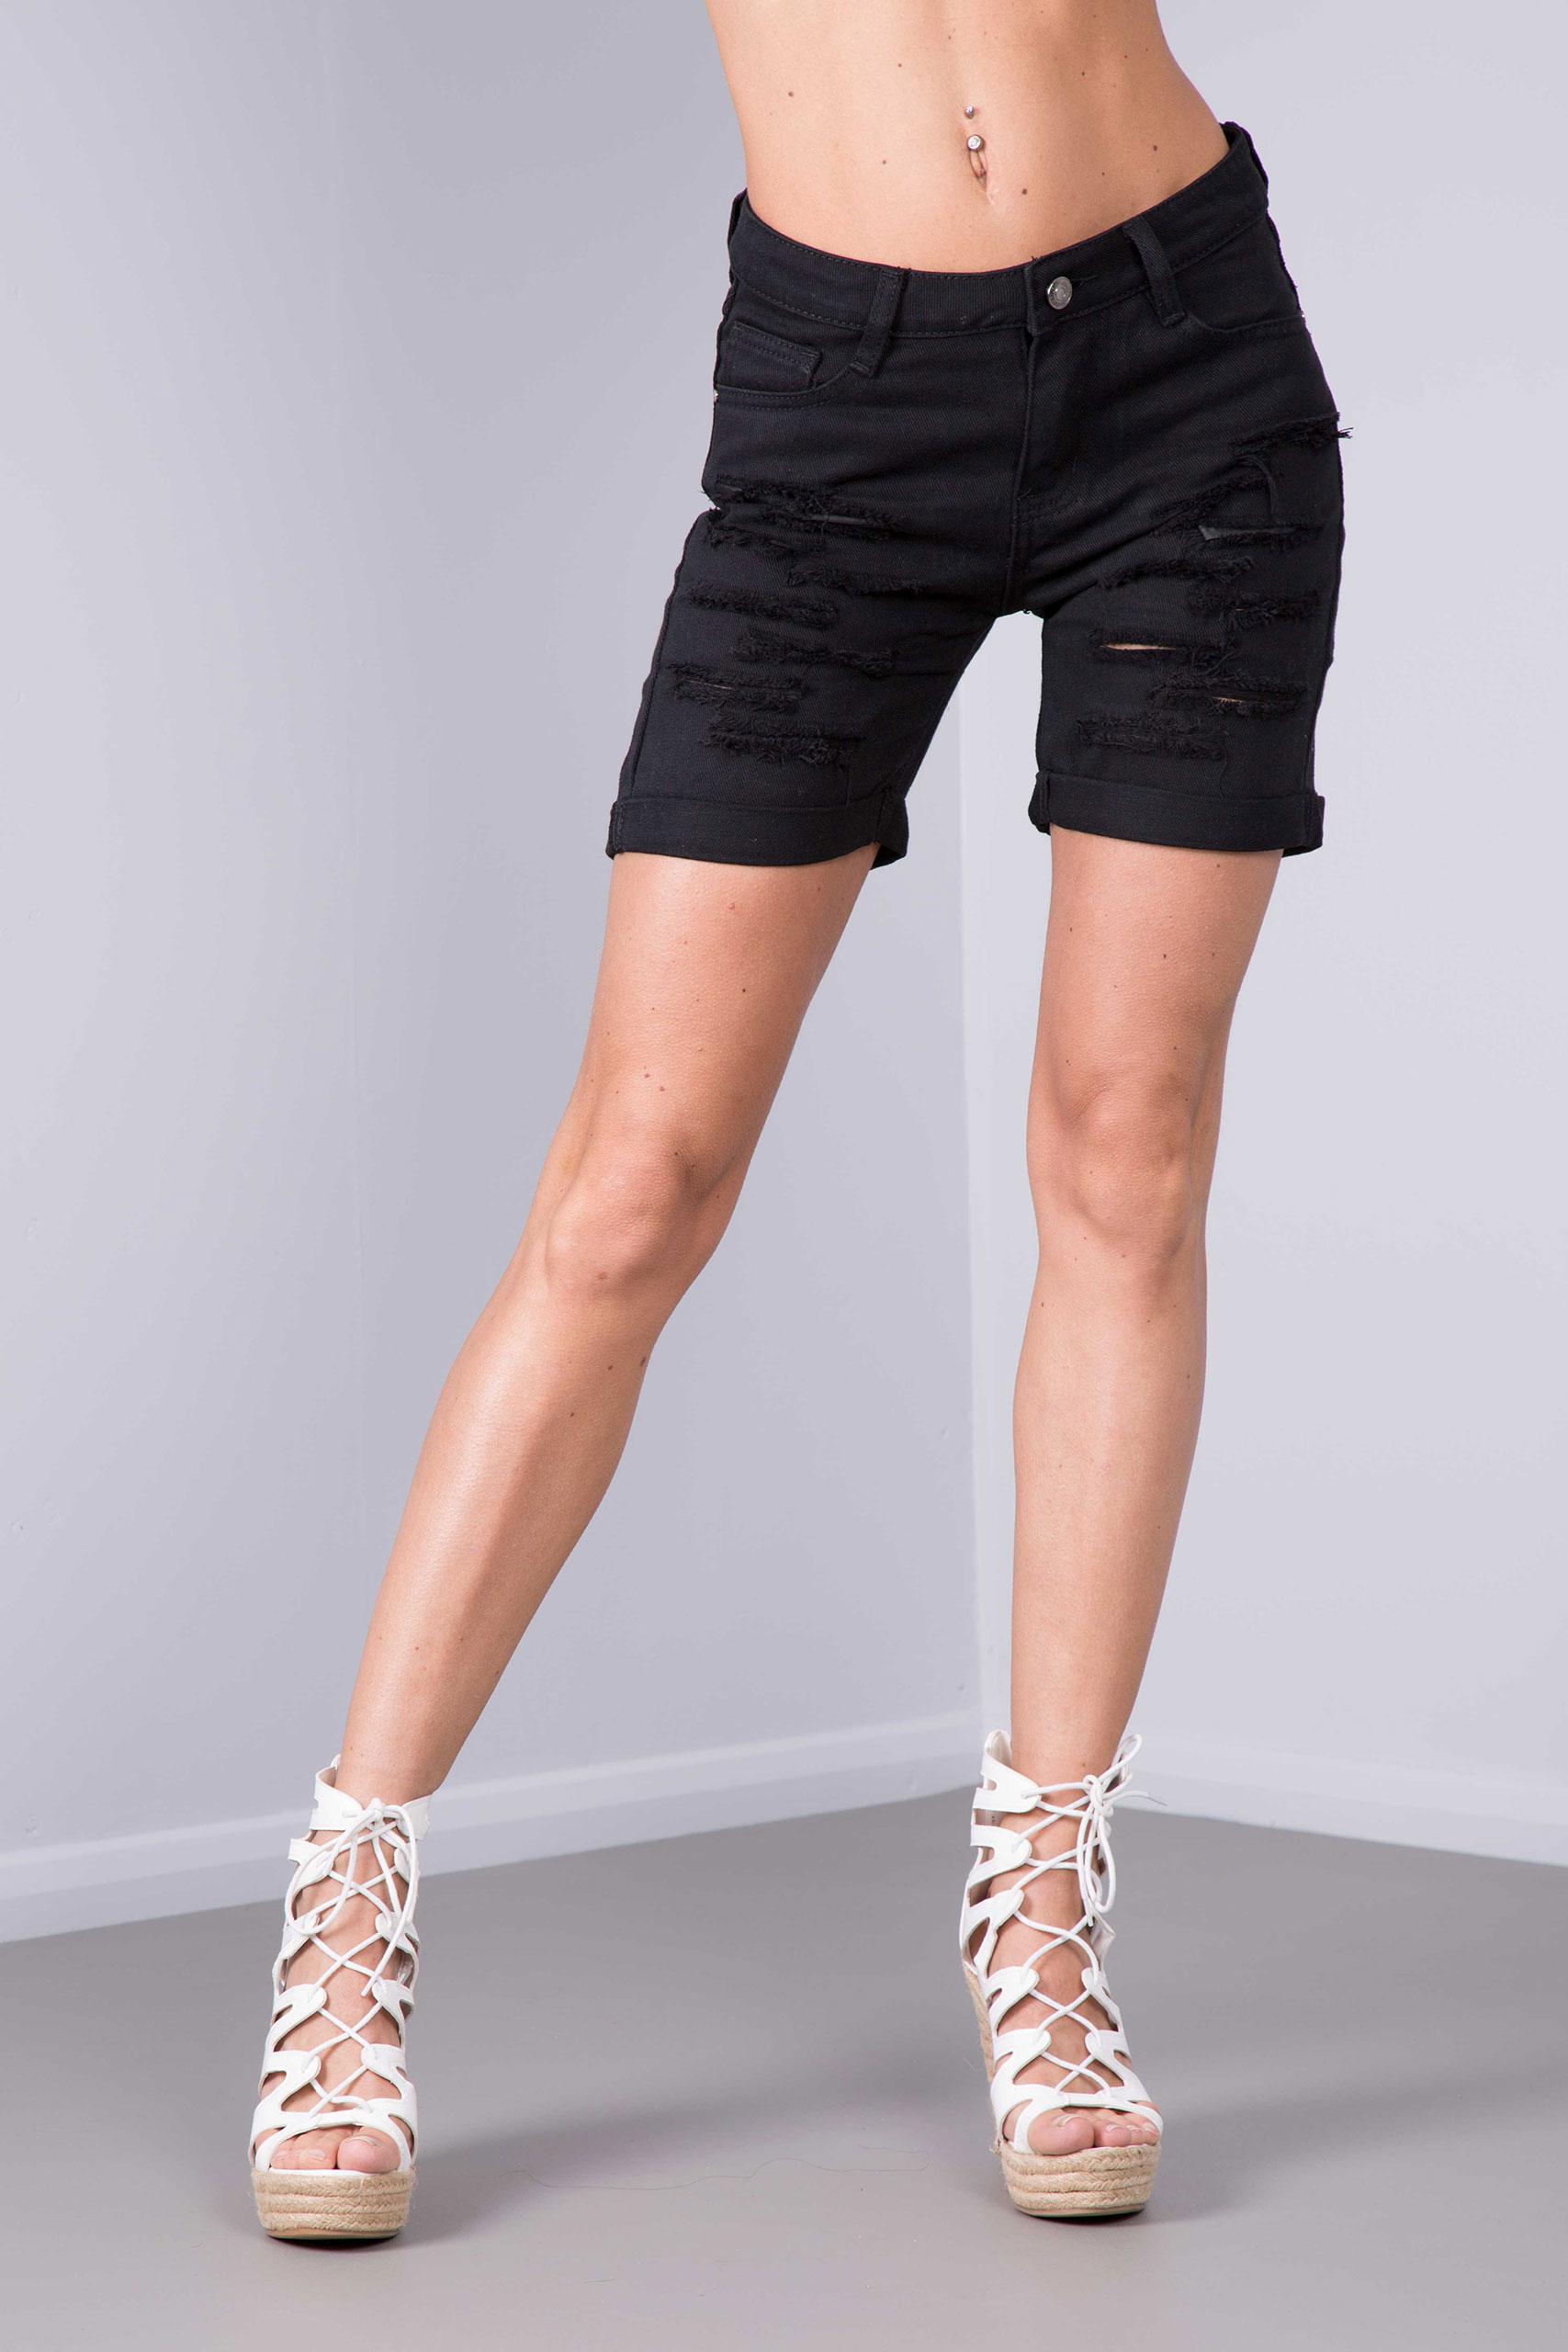 New Womens Ladies Black White Ripped Jeans Pant Summer Denim ...